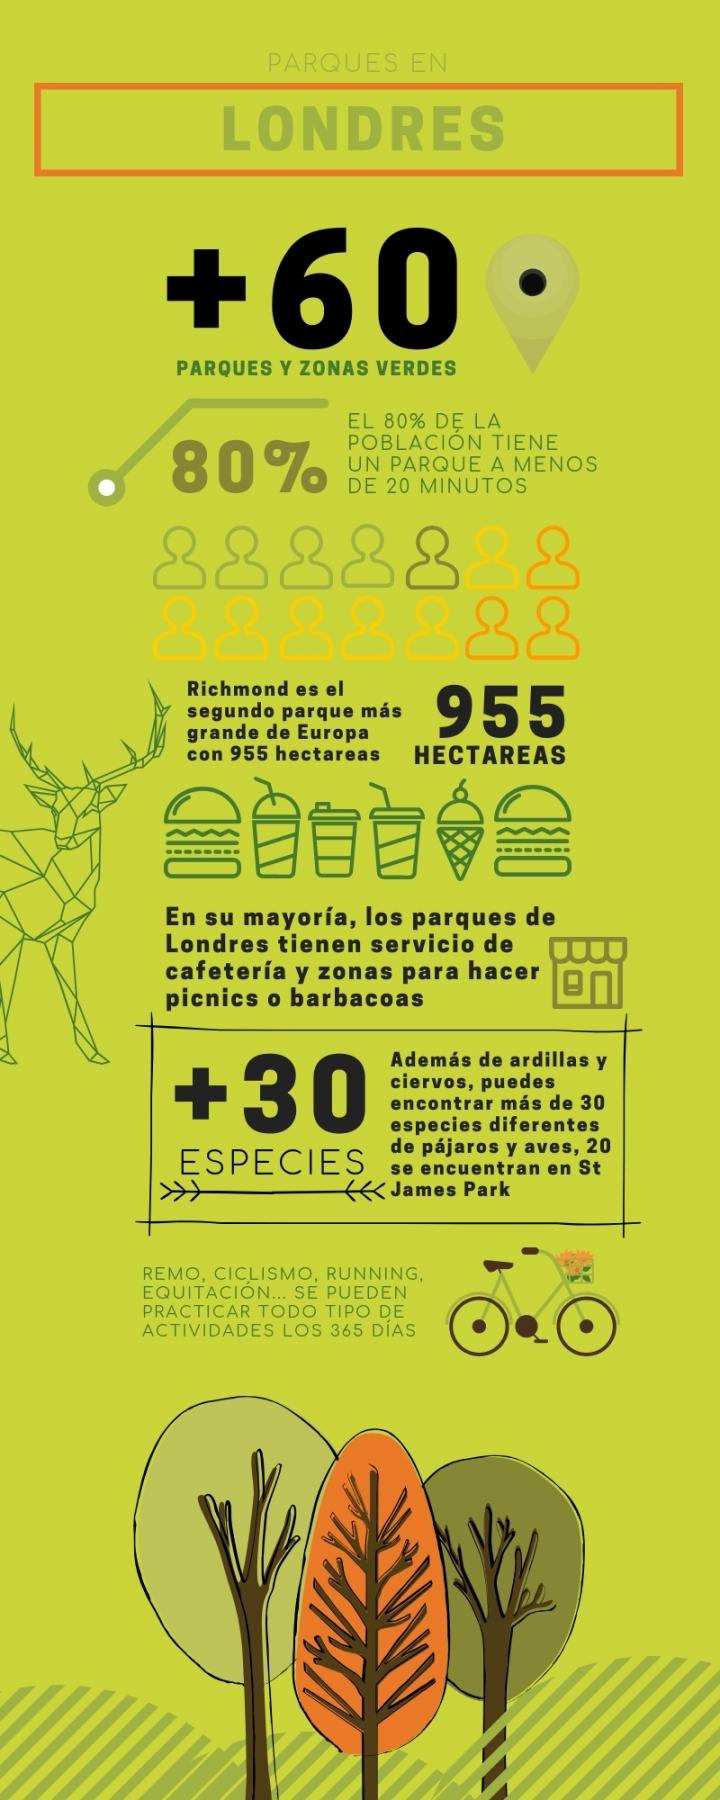 infografiaparqueslondres